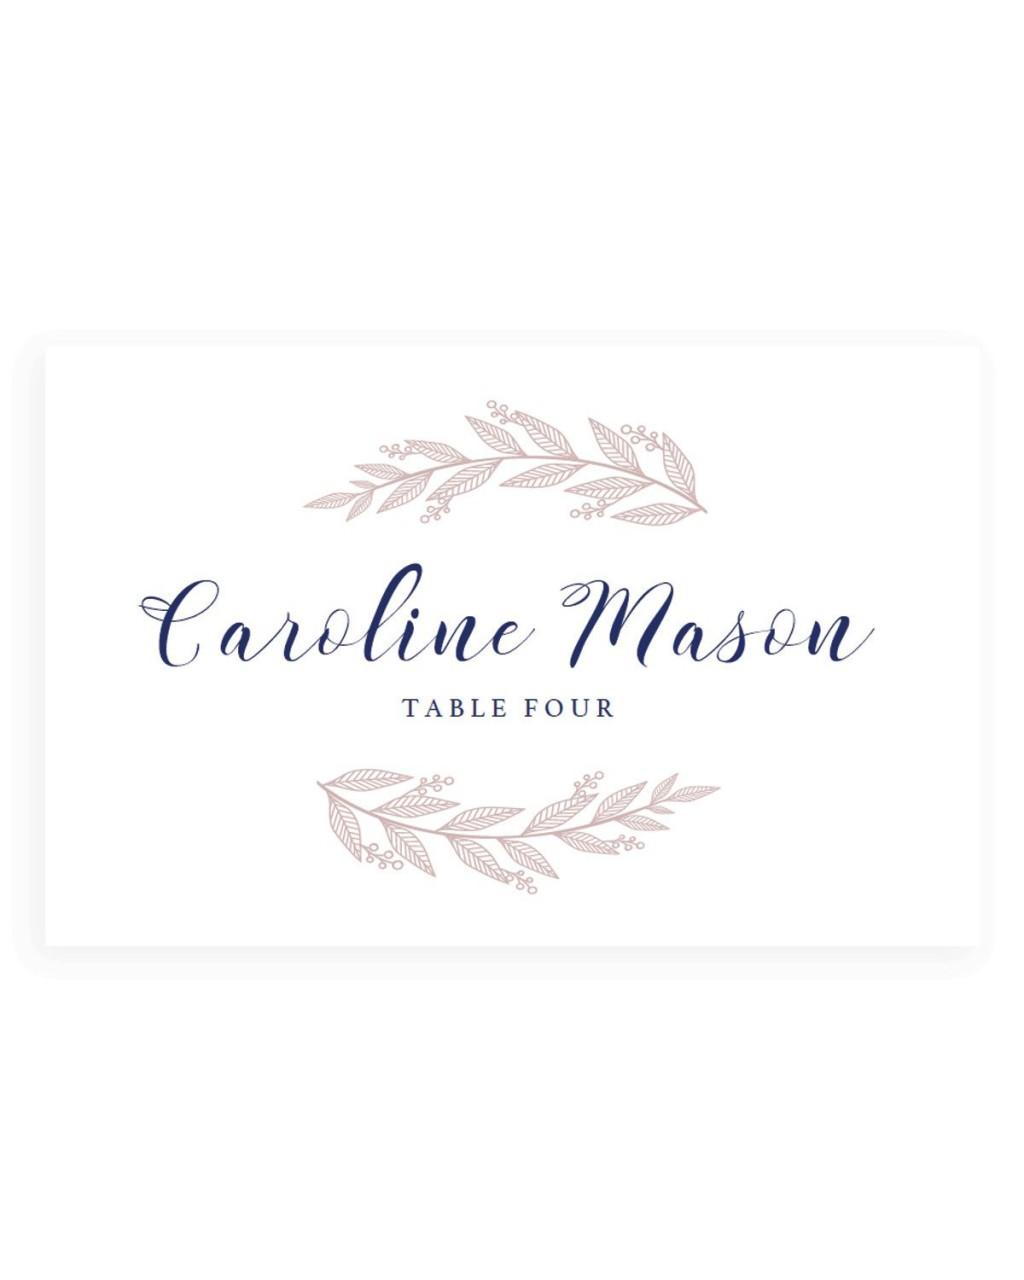 005 Fantastic Wedding Name Card Template Example  Free Download Design Sticker FormatLarge